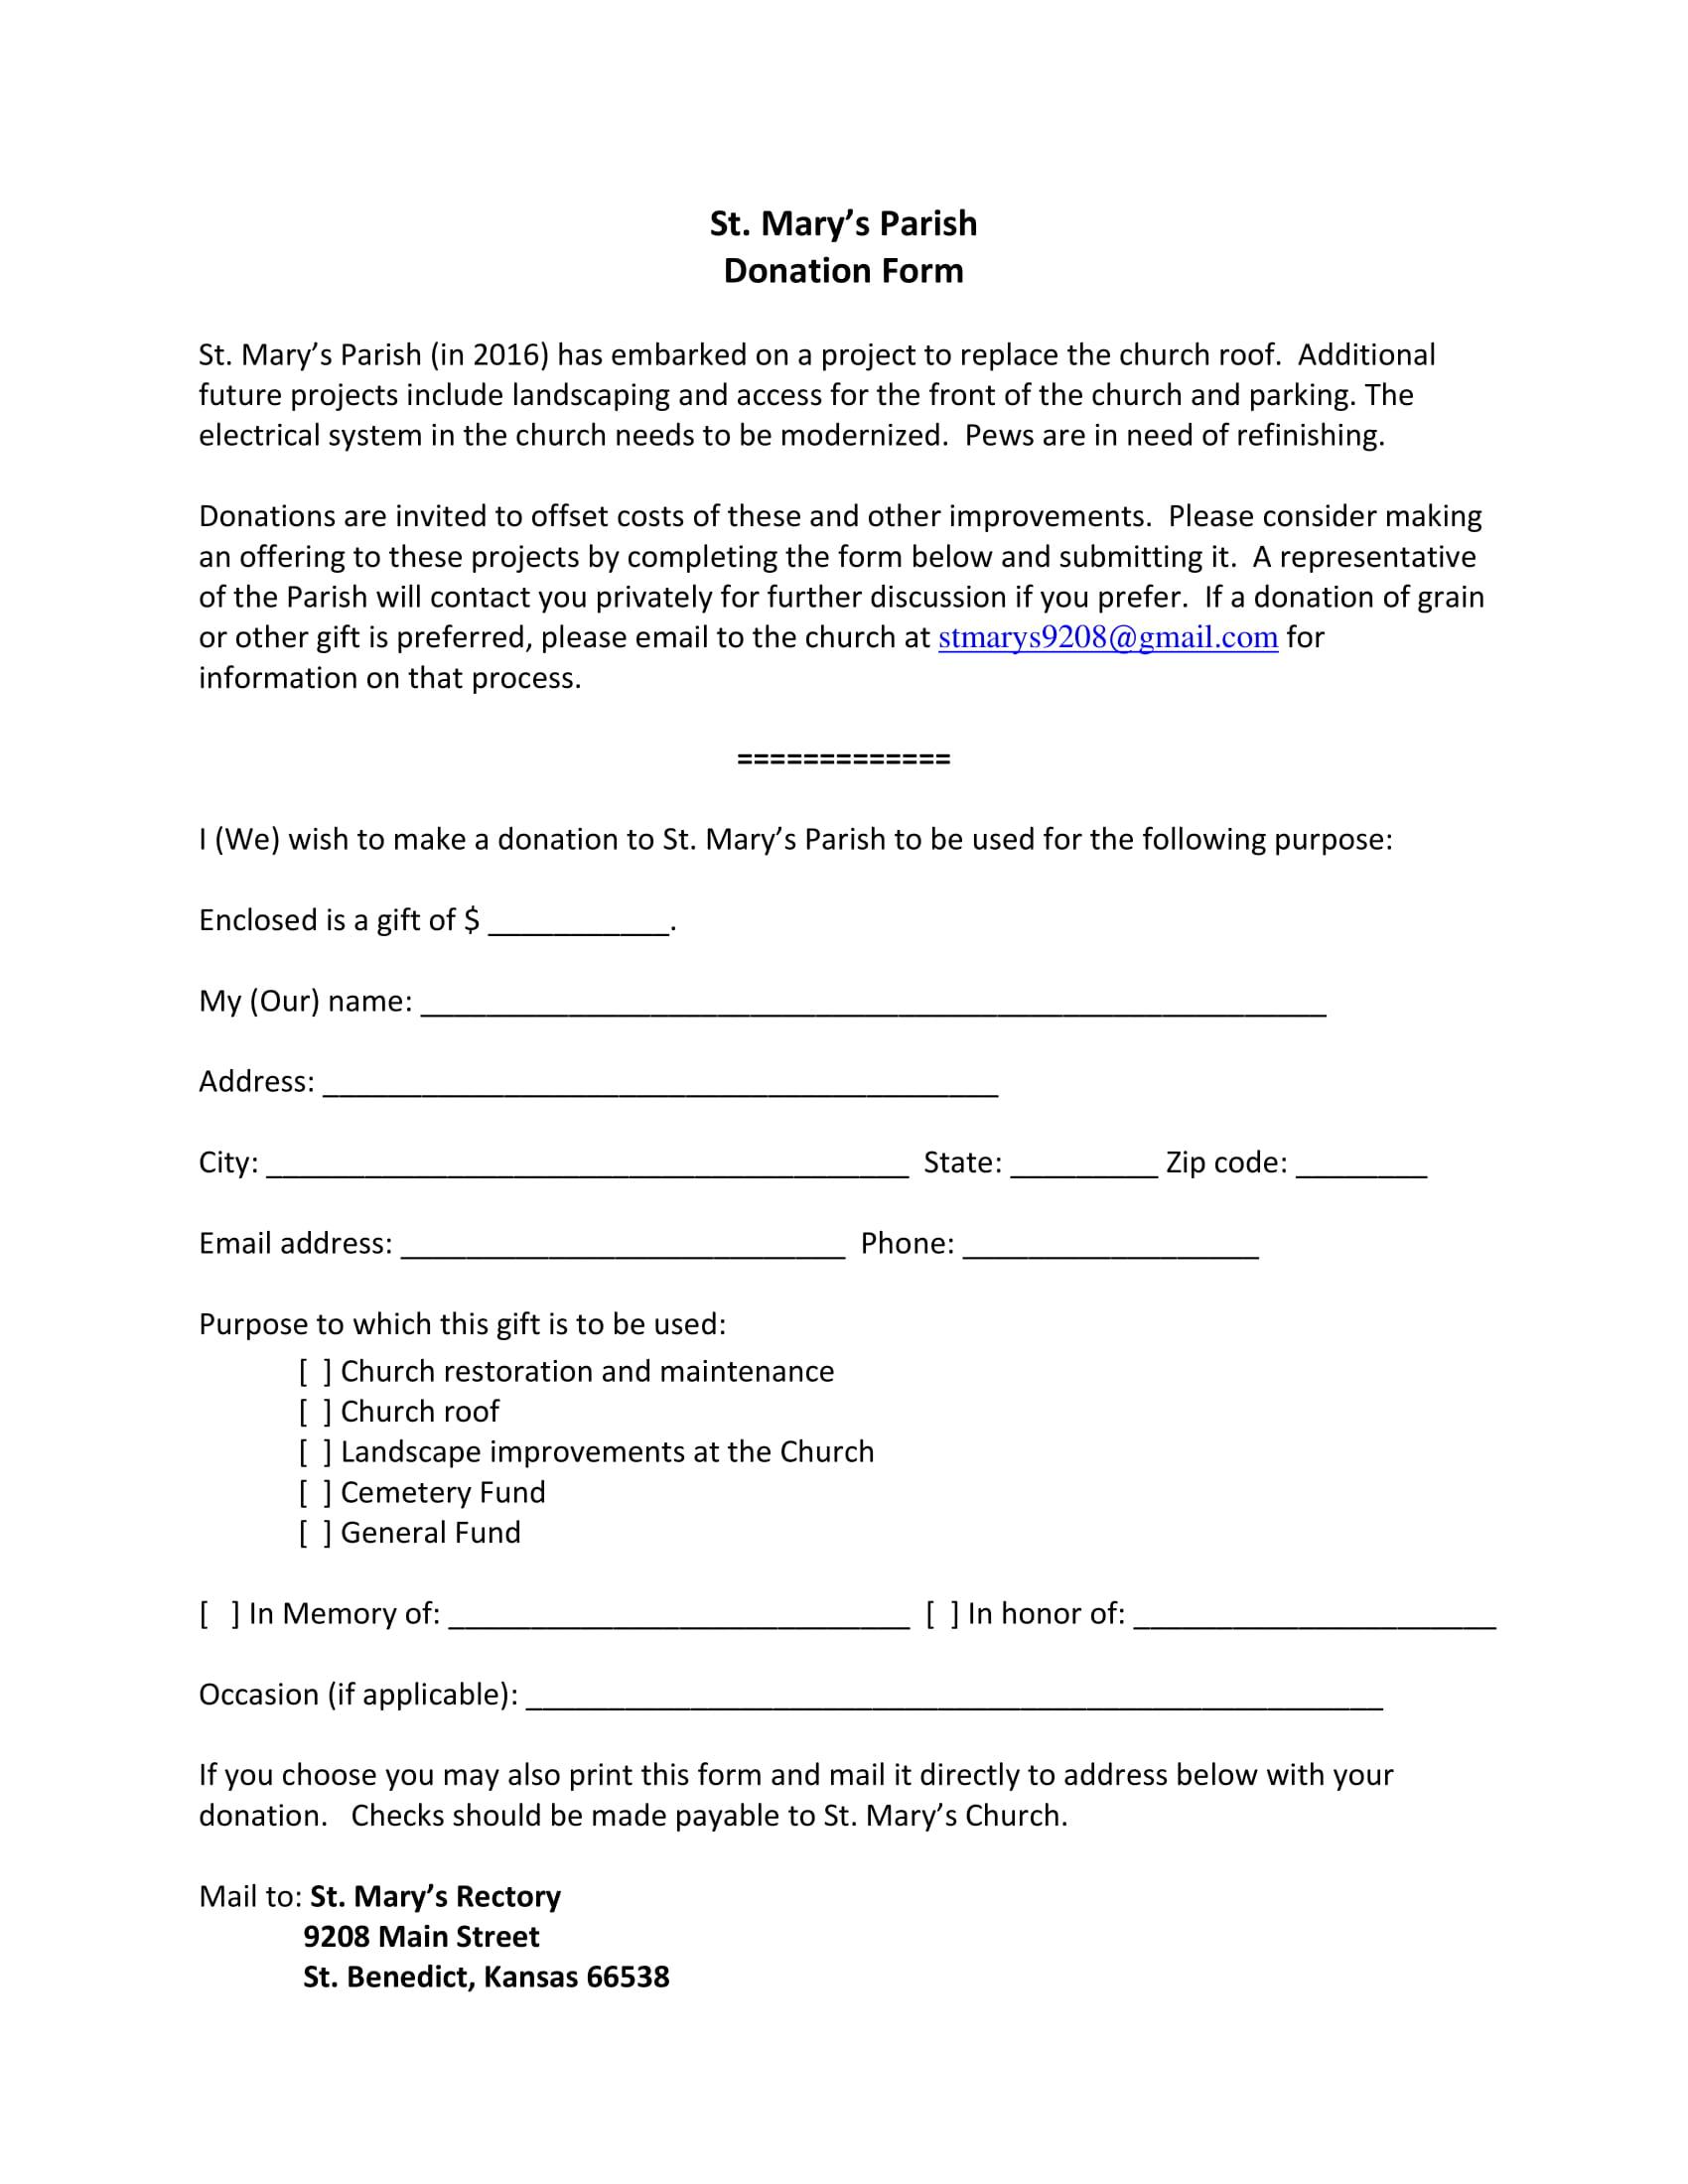 parish donation form 1